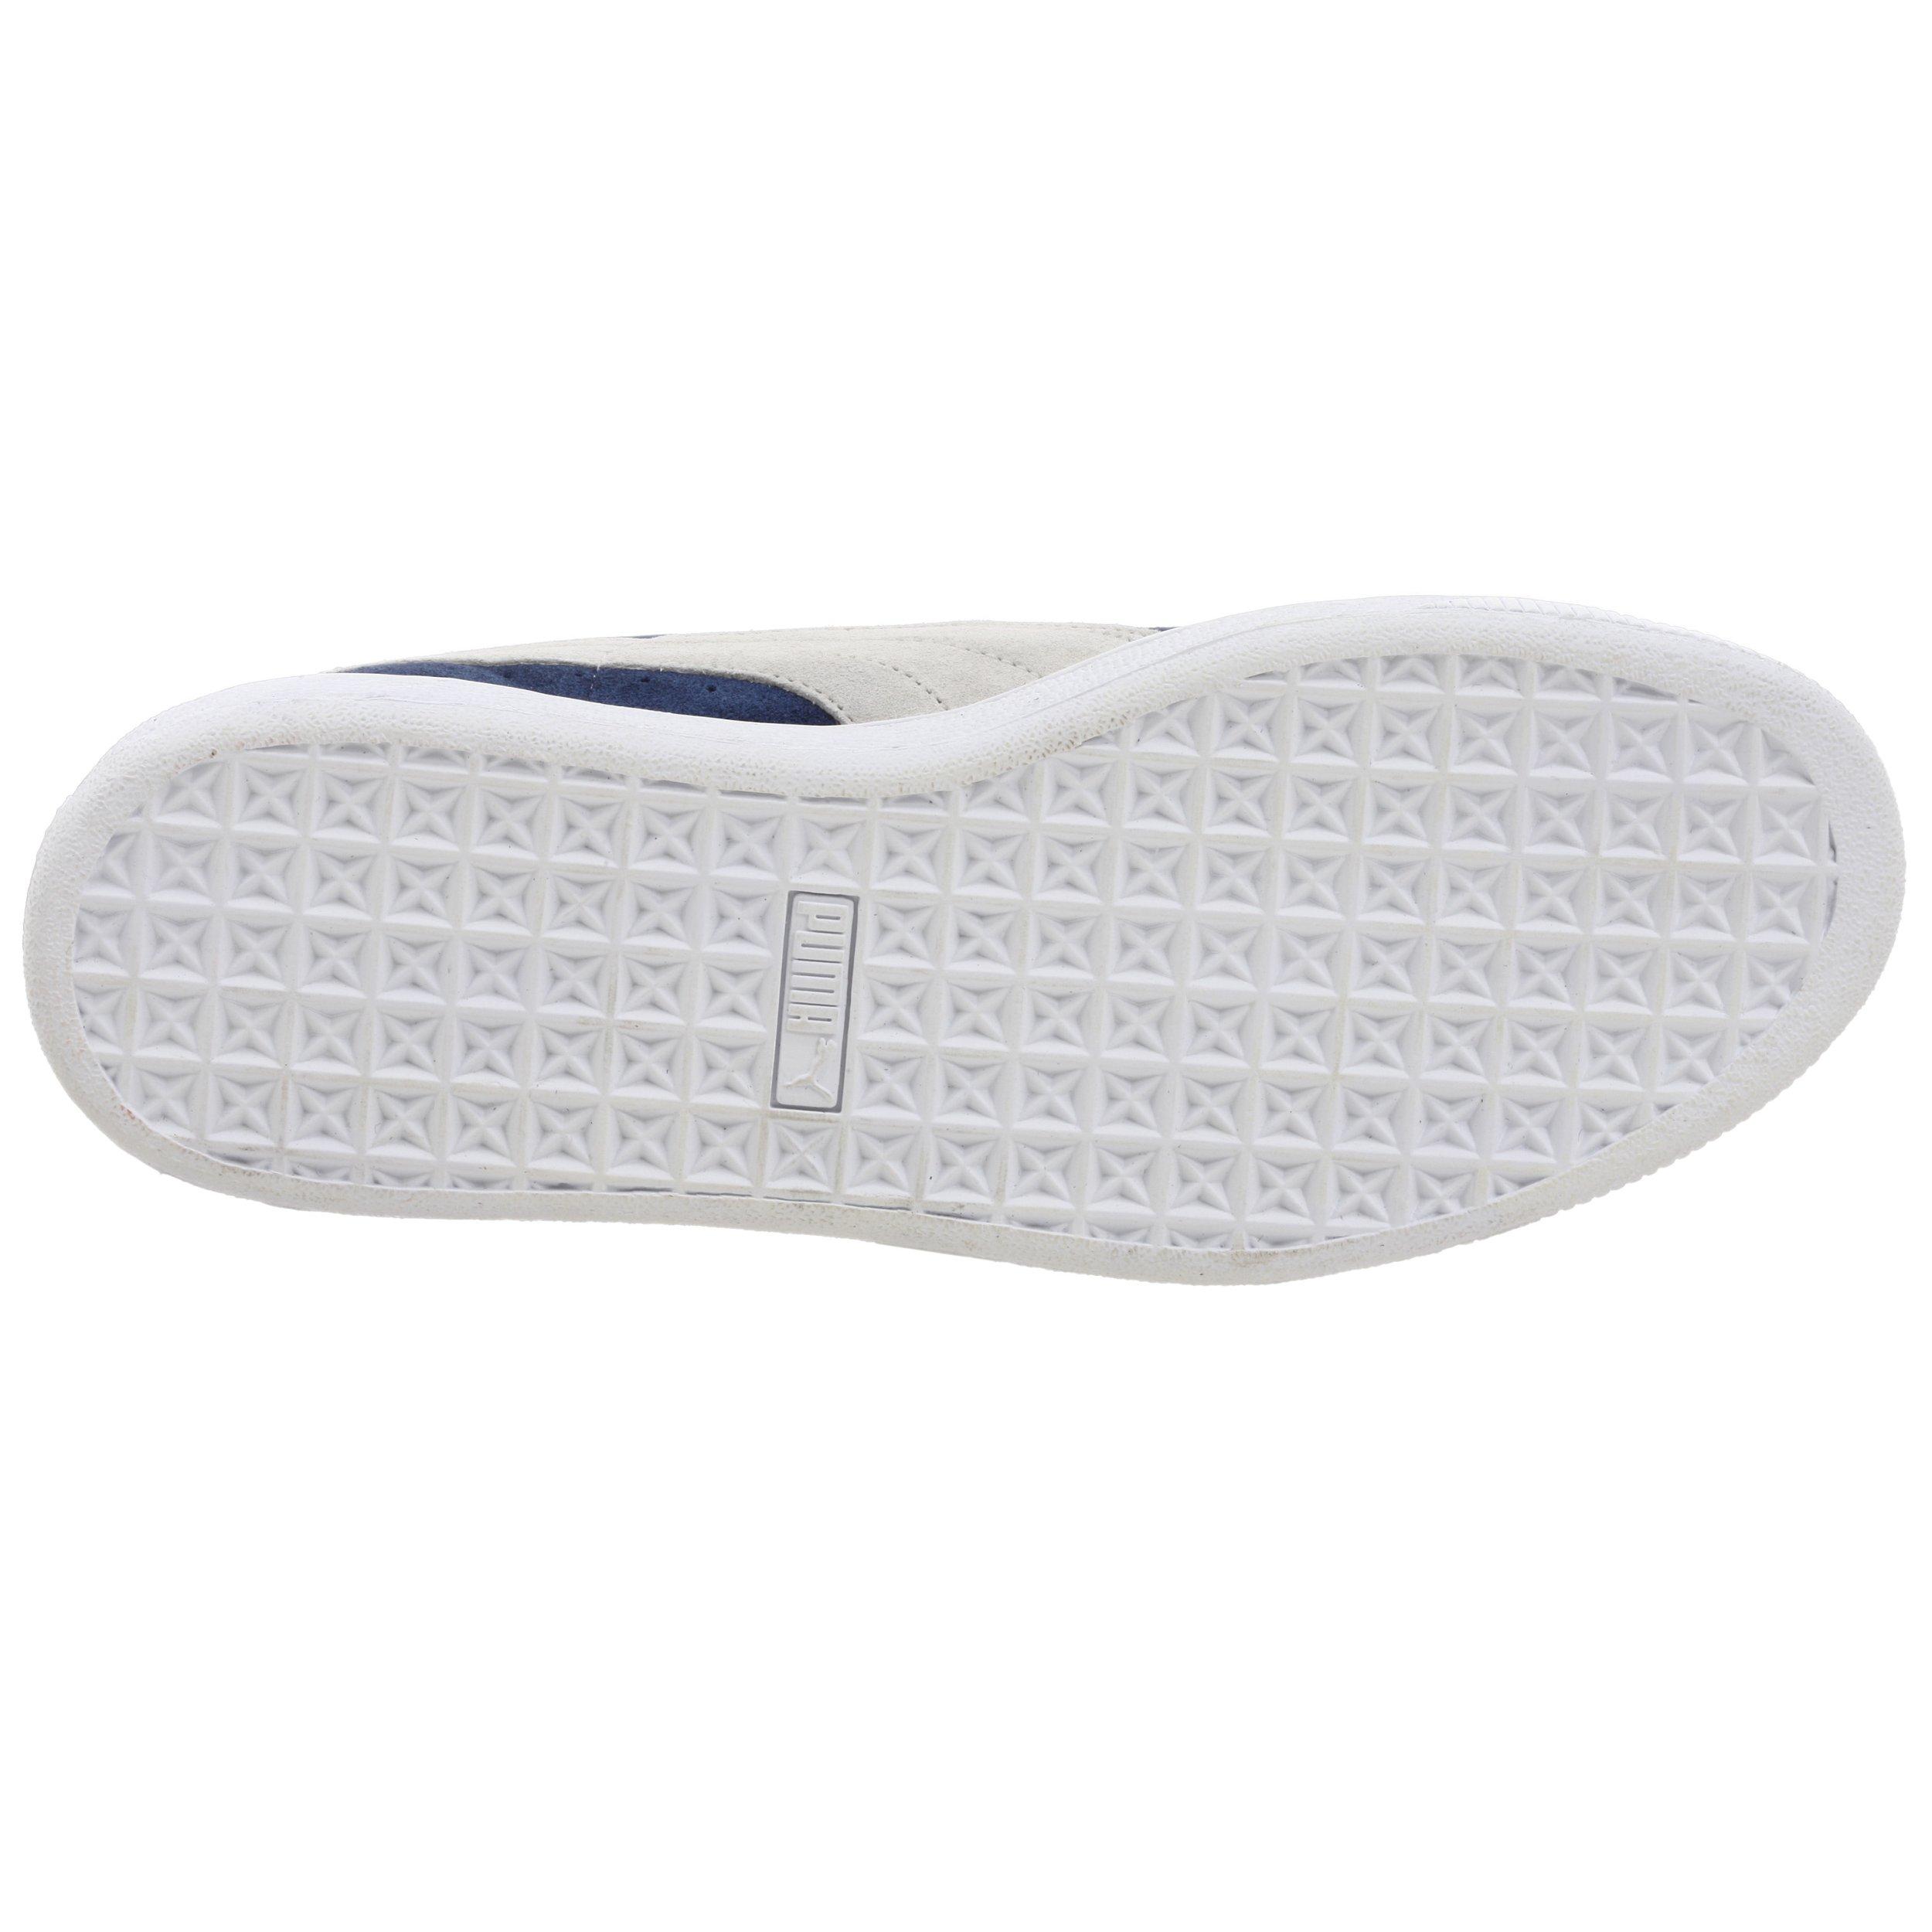 PUMA Suede Classic Sneaker,Blue/White,8 M US Men's by PUMA (Image #3)